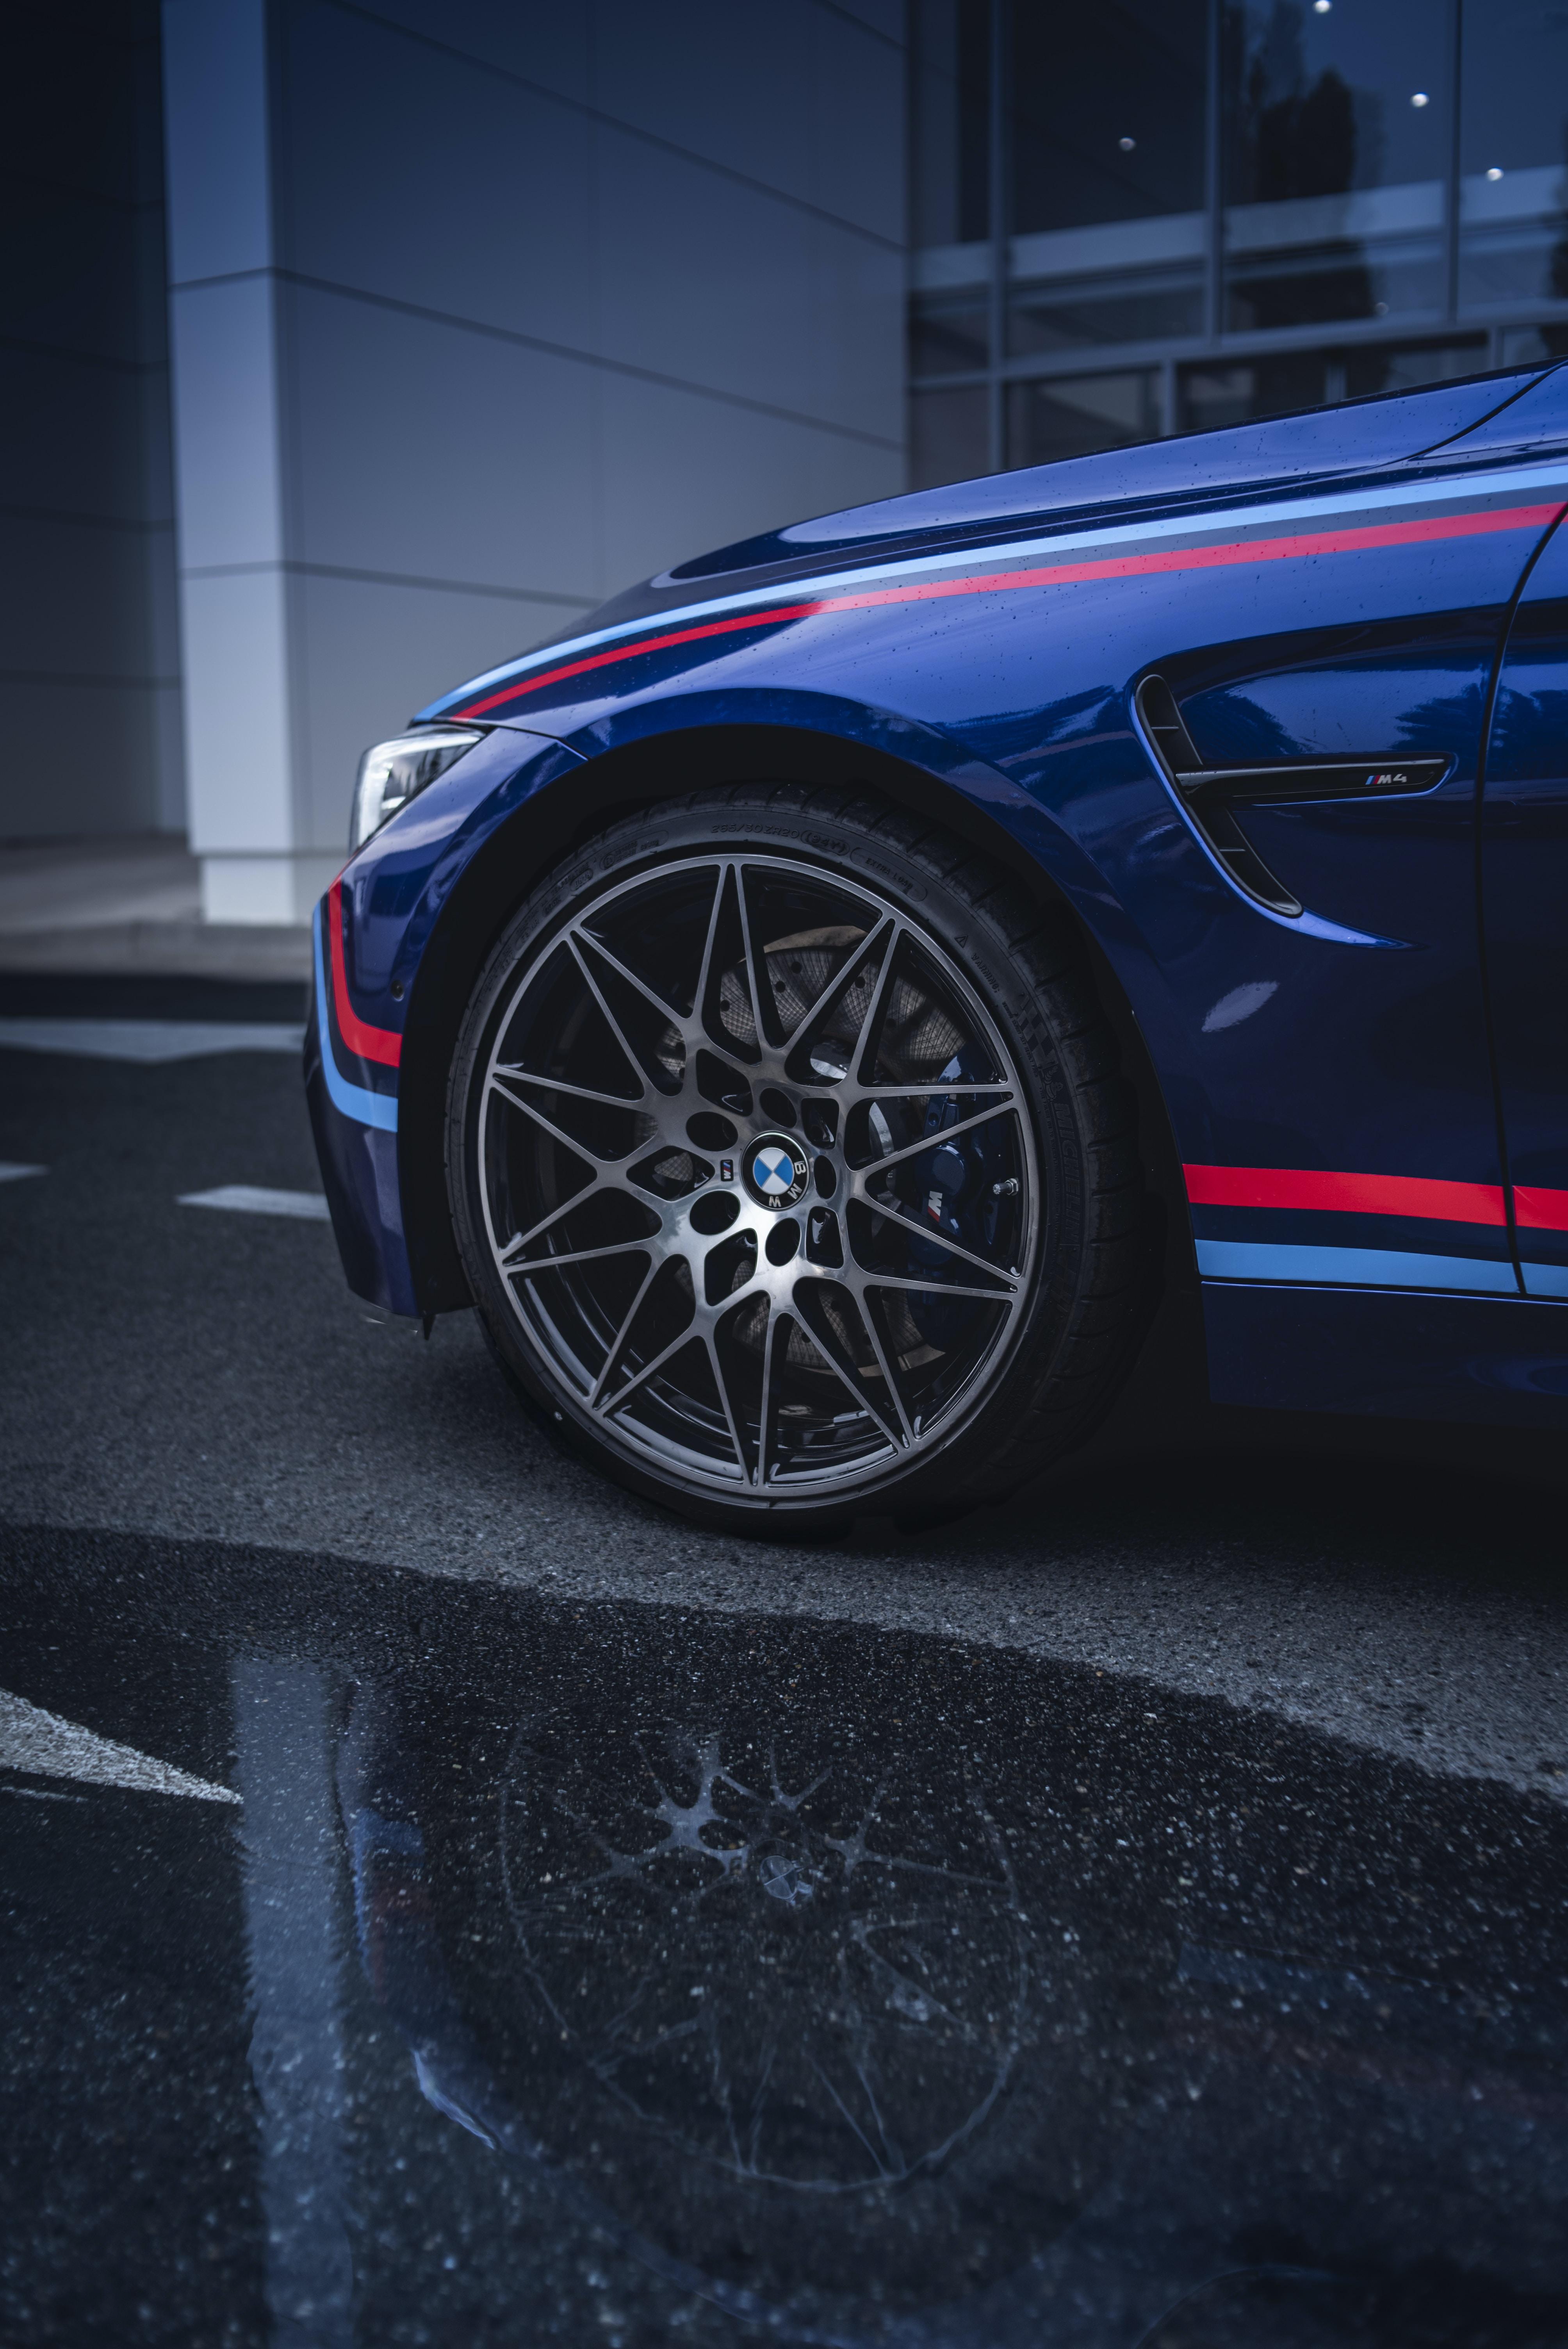 black and blue car wheel